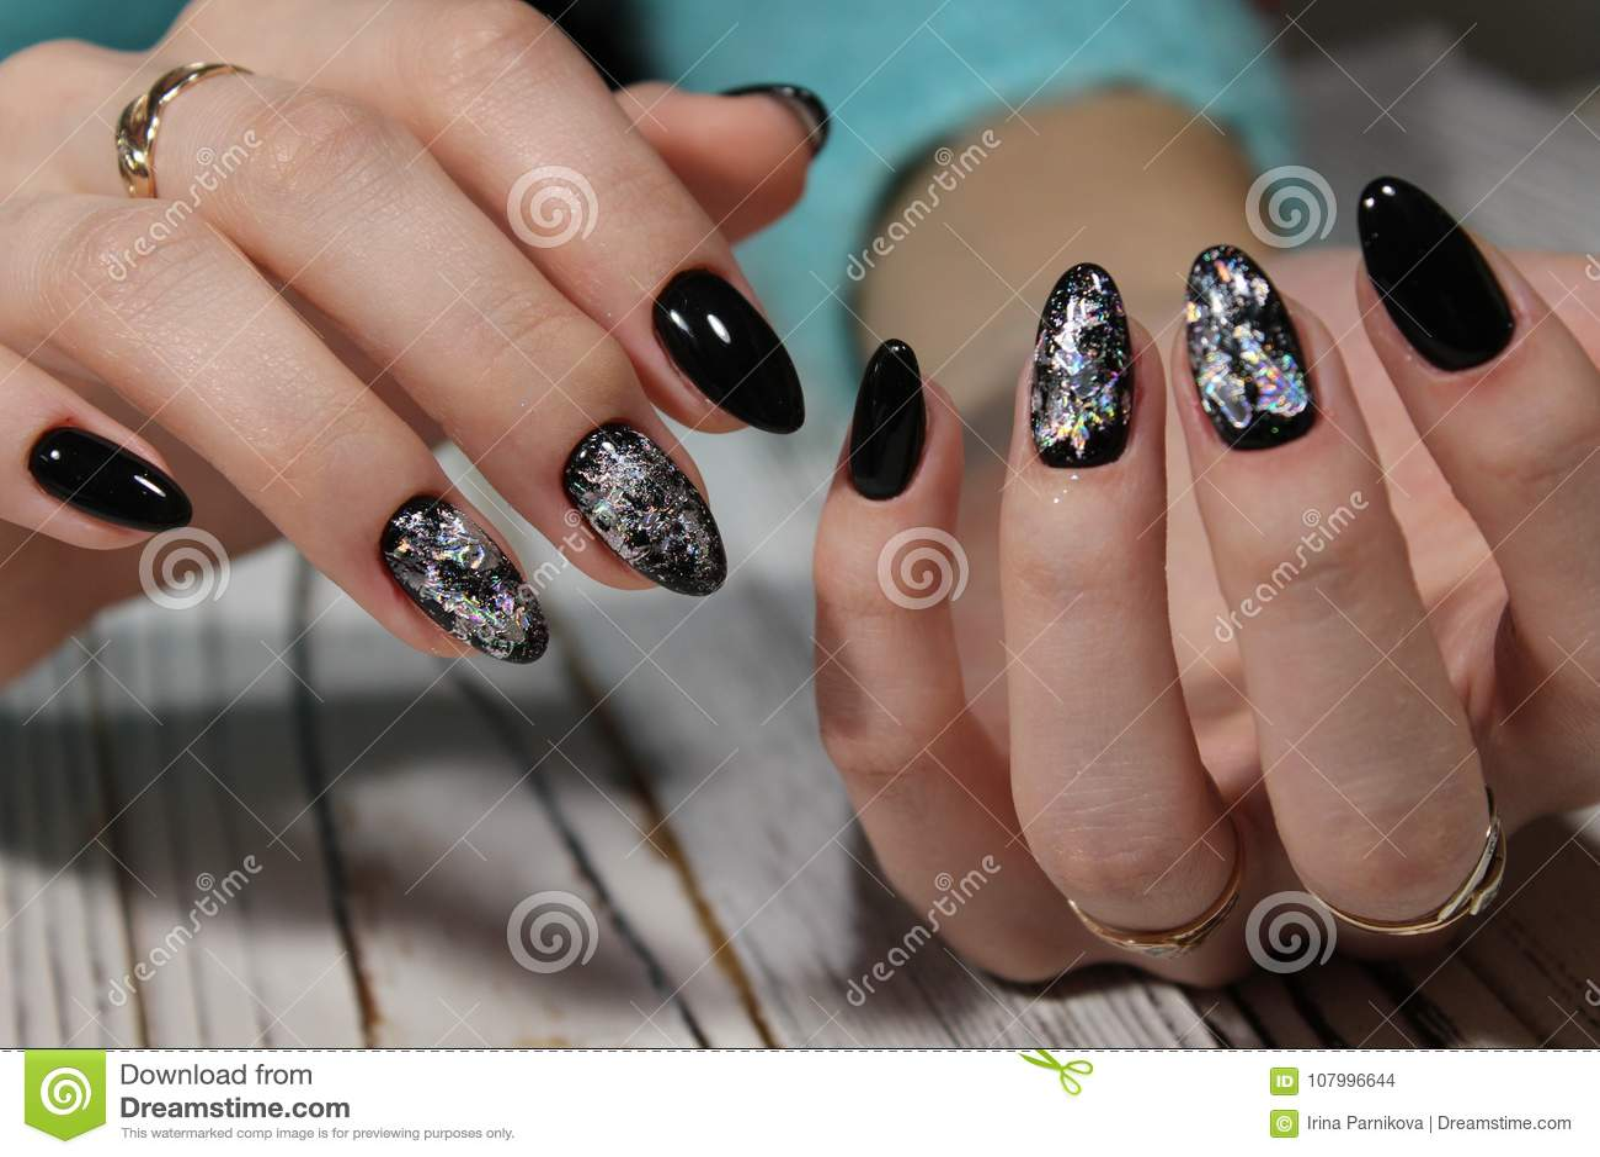 Black Long Nails Stock Photo Image Of Manicured Girl 107996644